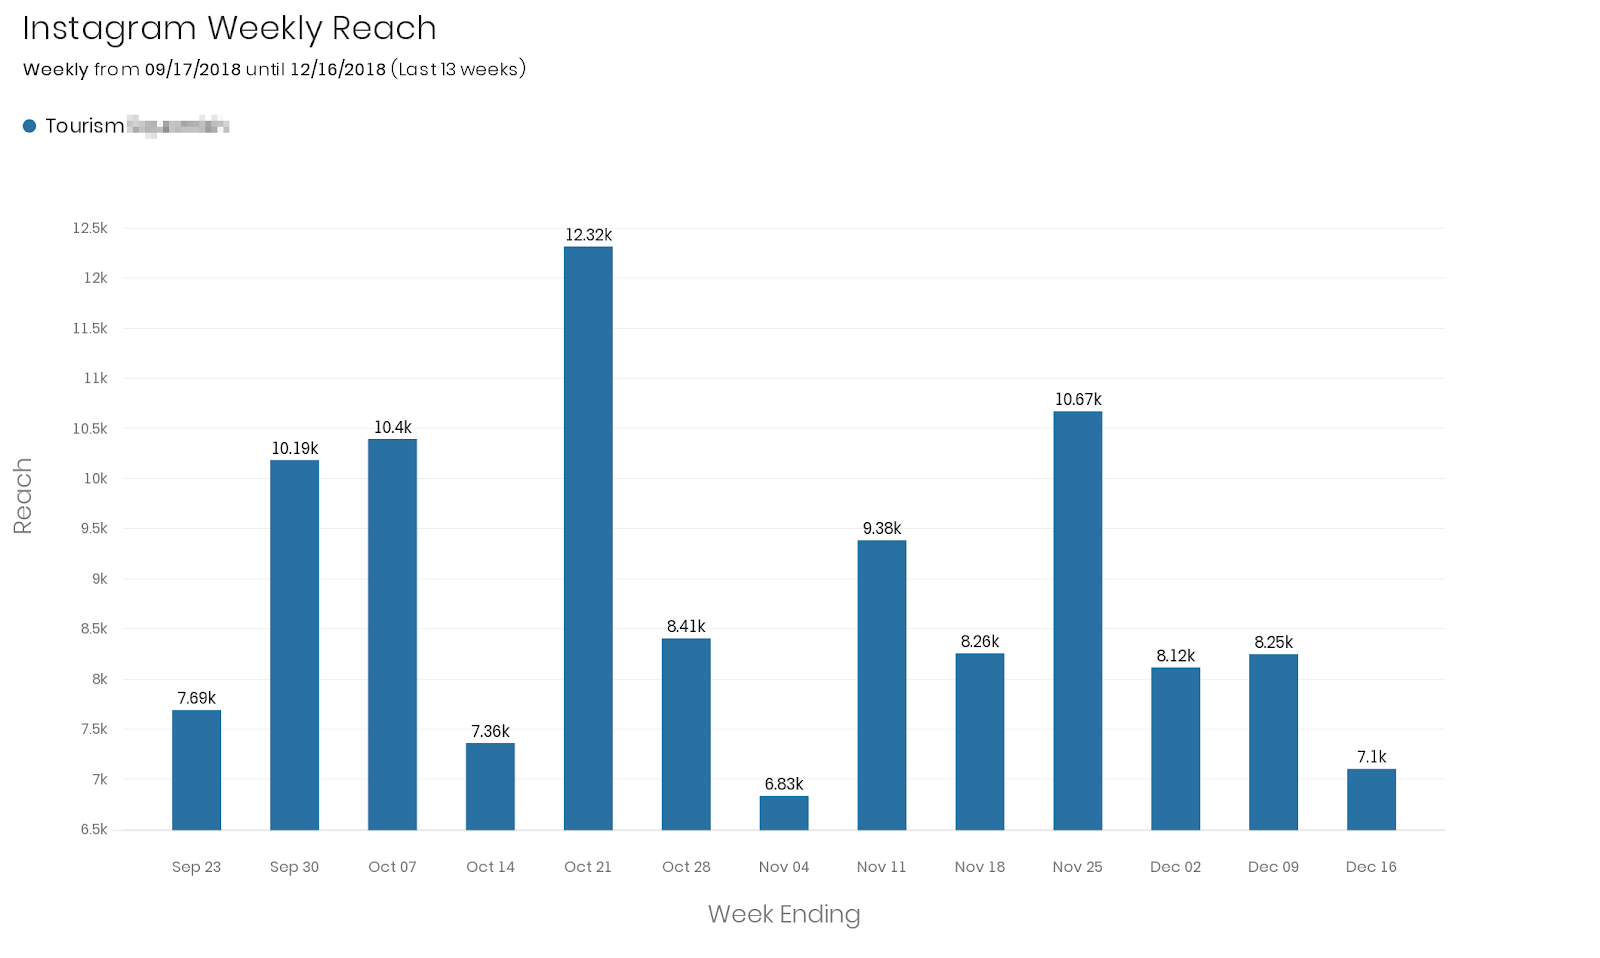 insta-weekly-reach